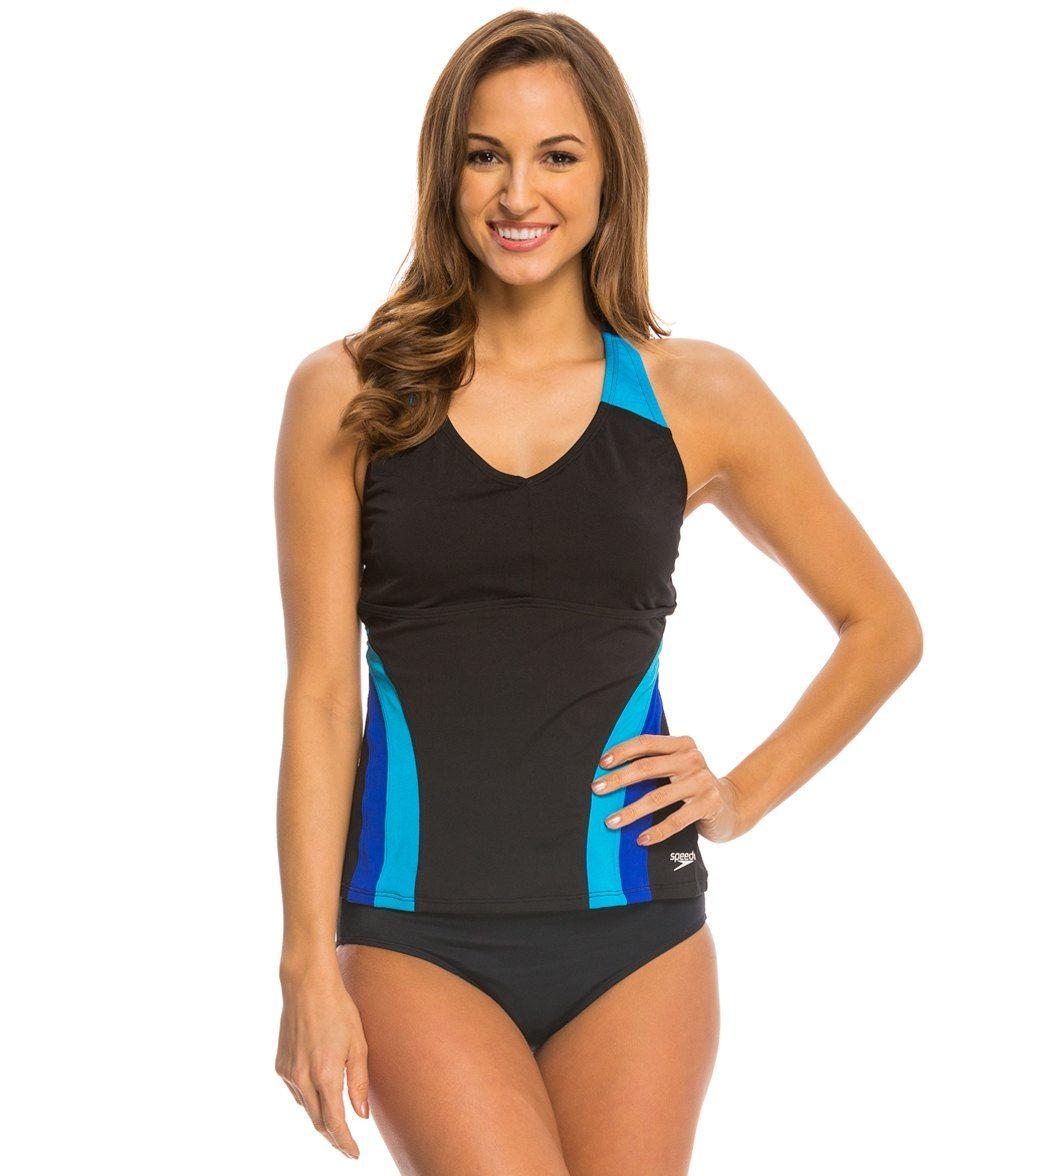 d728fa6cc39bb Reebok Women's Andie Stripe Mesh Tankini Top | DICK'S Sporting Goods | Now  that's my style. | Tankini, Bikini tops, Tankini top